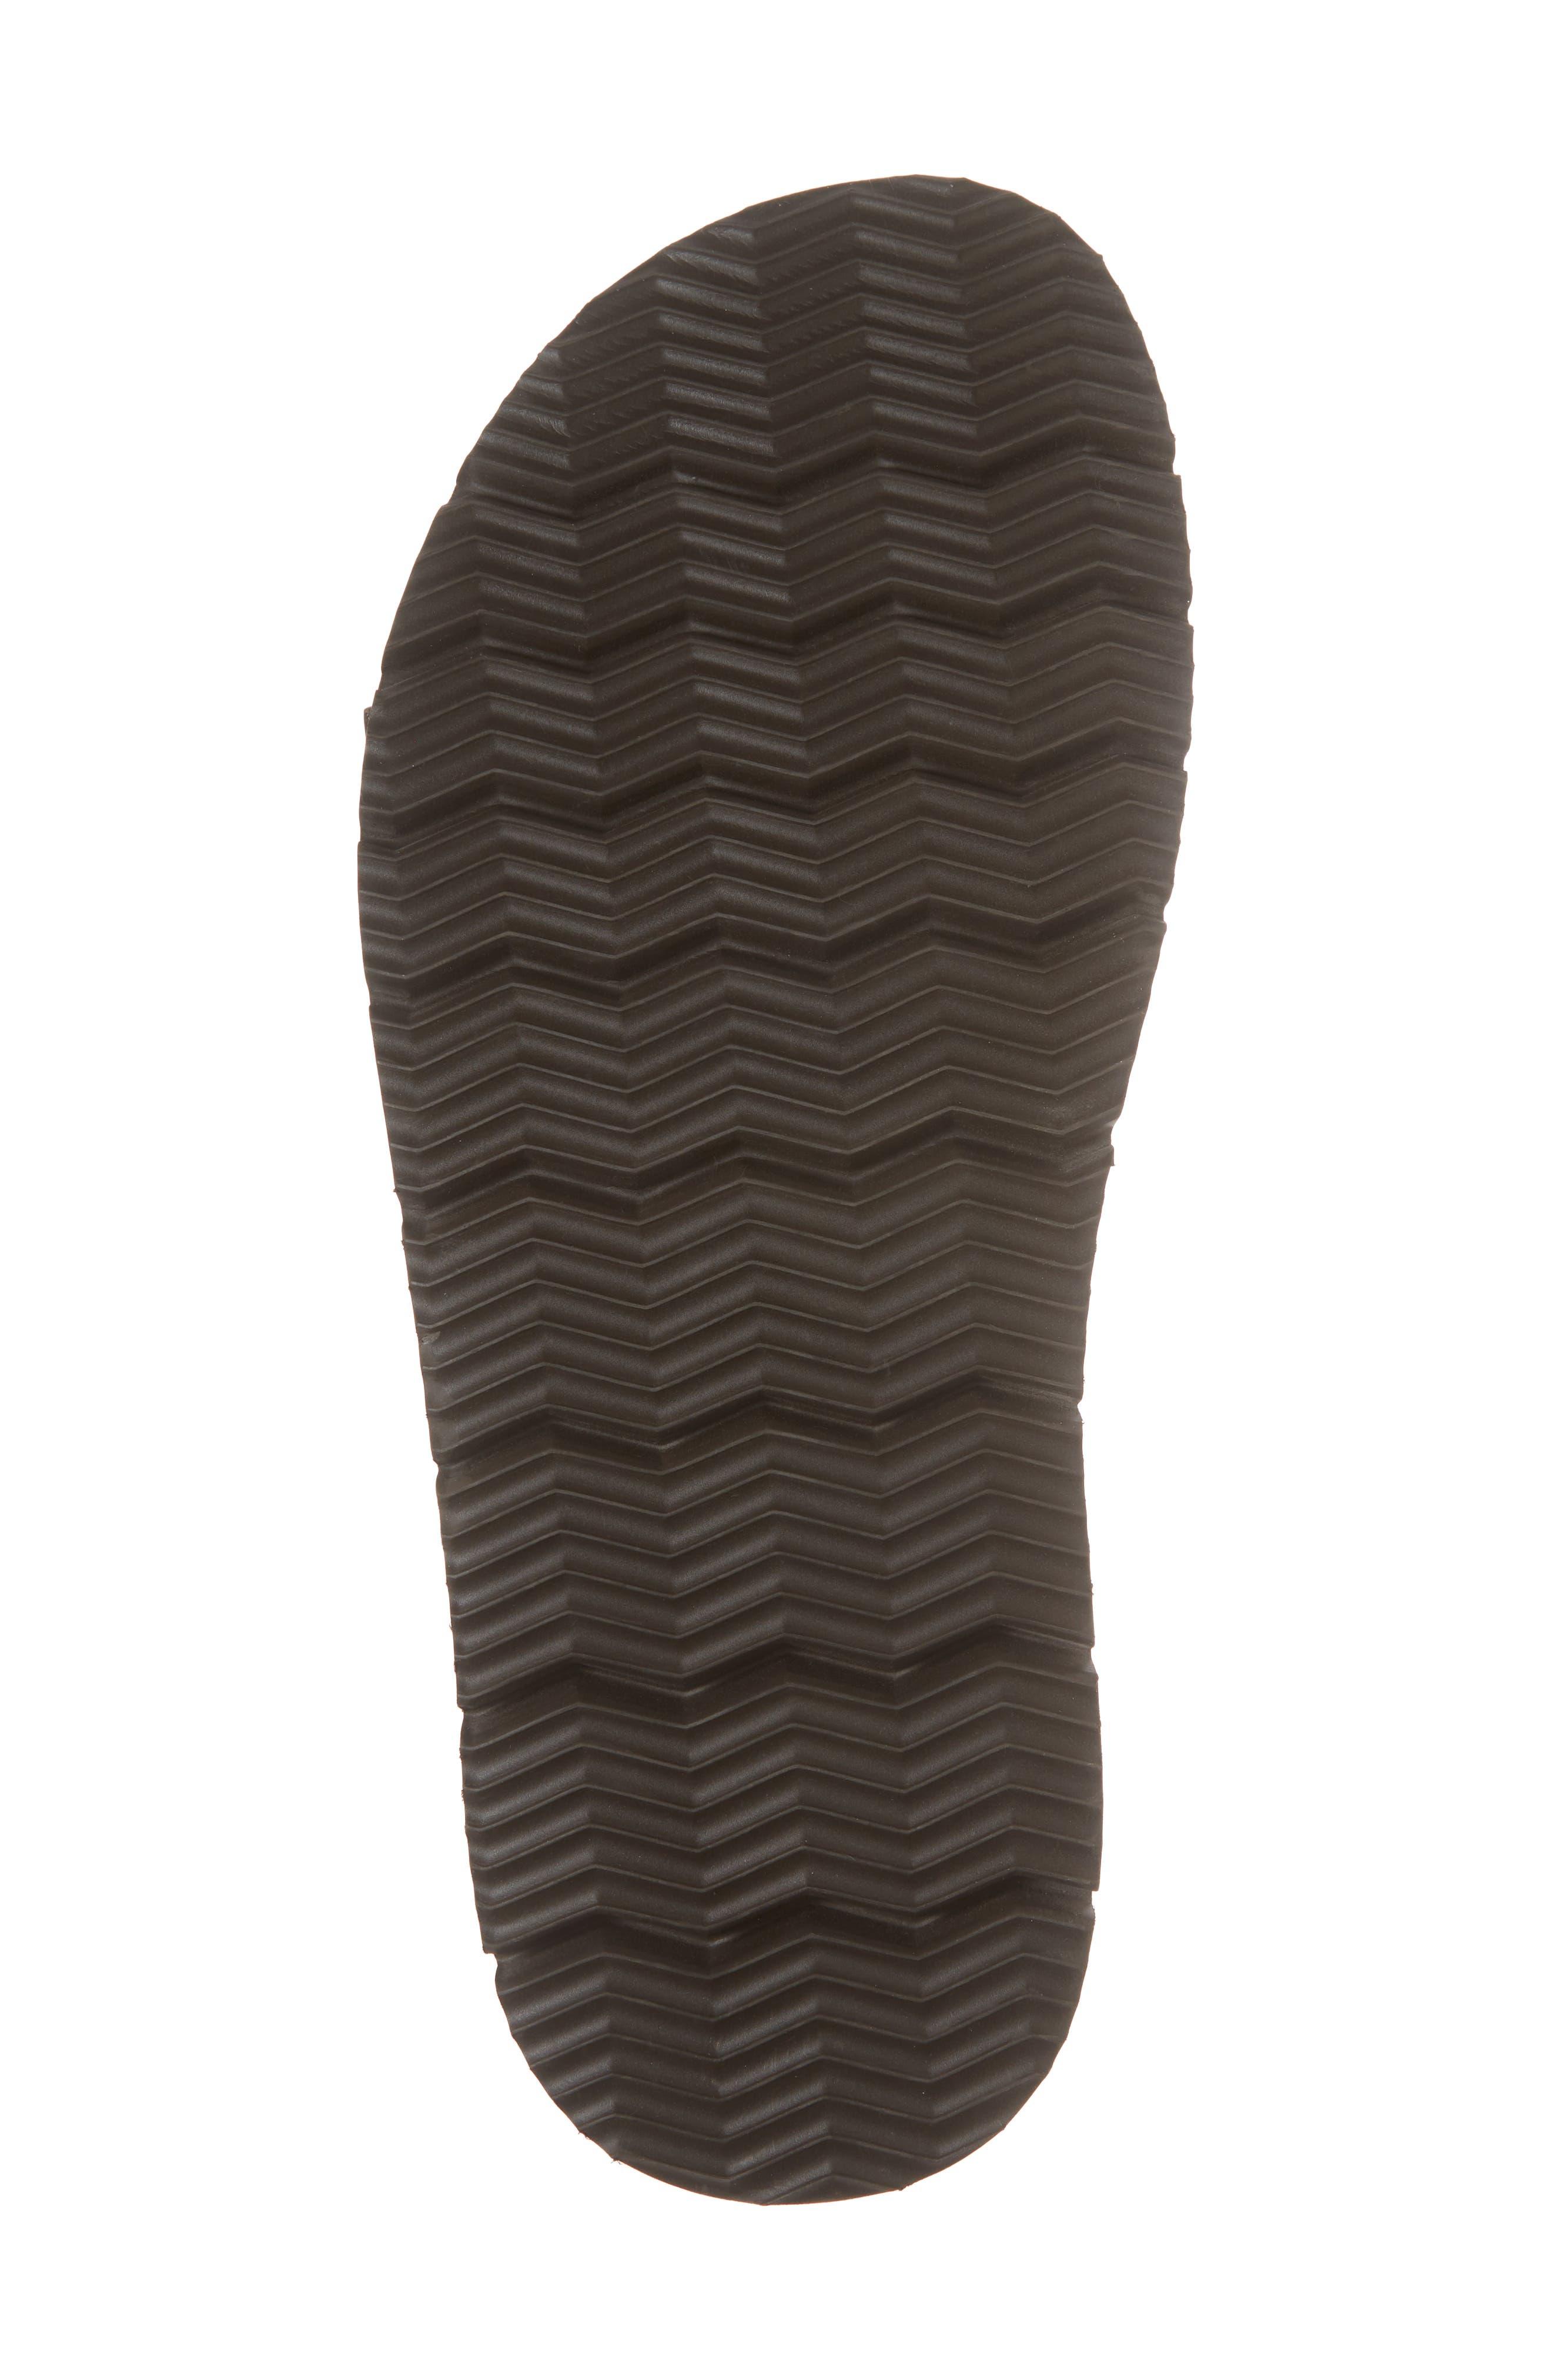 Slide Sandal,                             Alternate thumbnail 6, color,                             Expresso/ Tan Leather